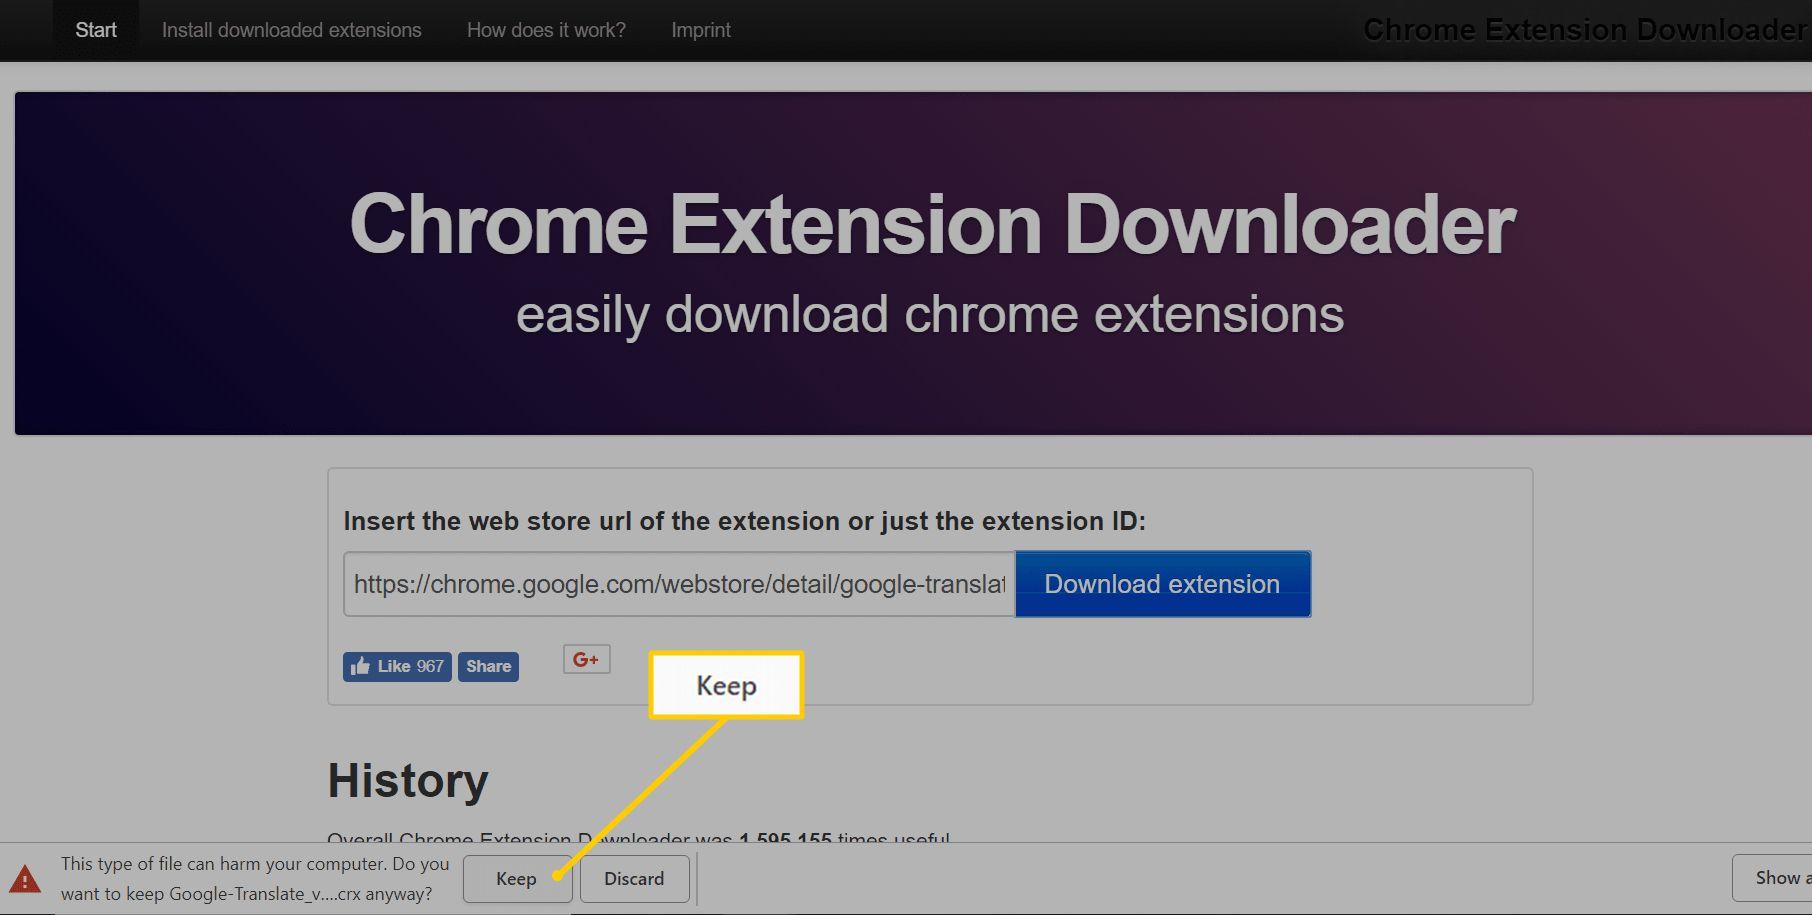 Keep button in Chrome